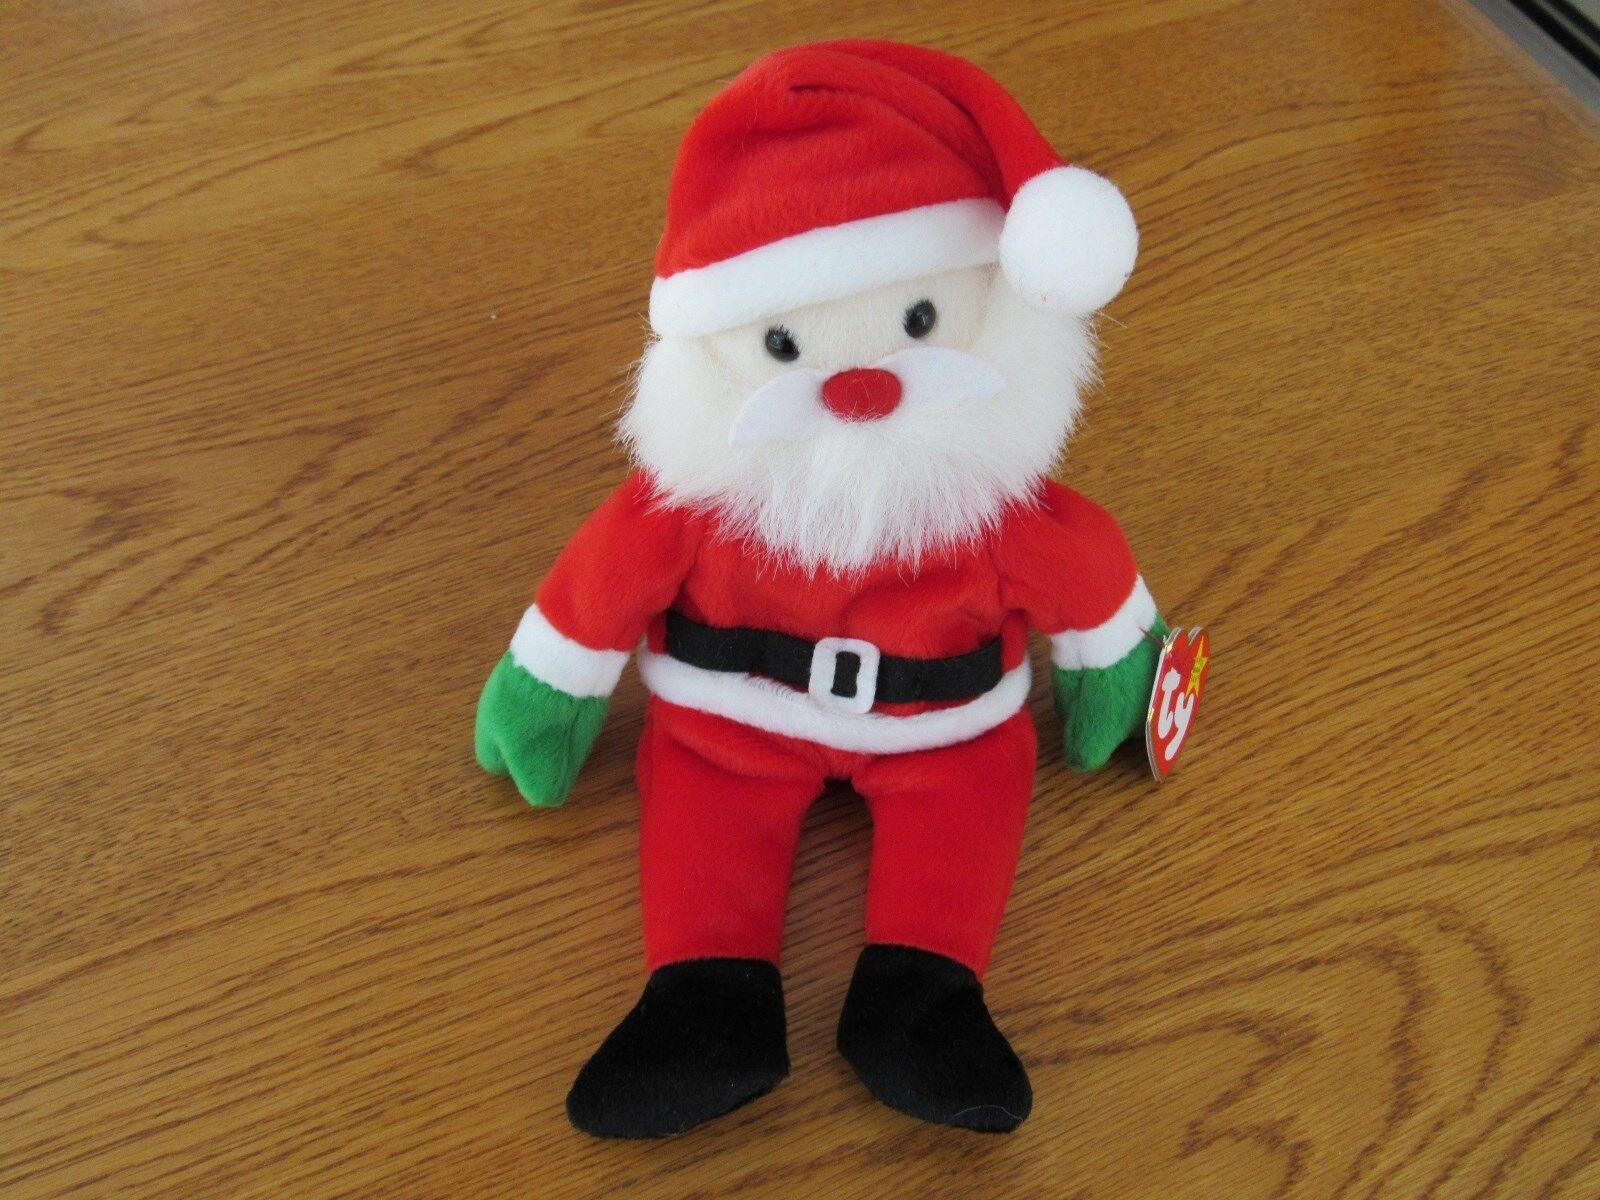 NEW TY Beanie Baby -  Santa  The Christmas Bear - 1998 - Retired